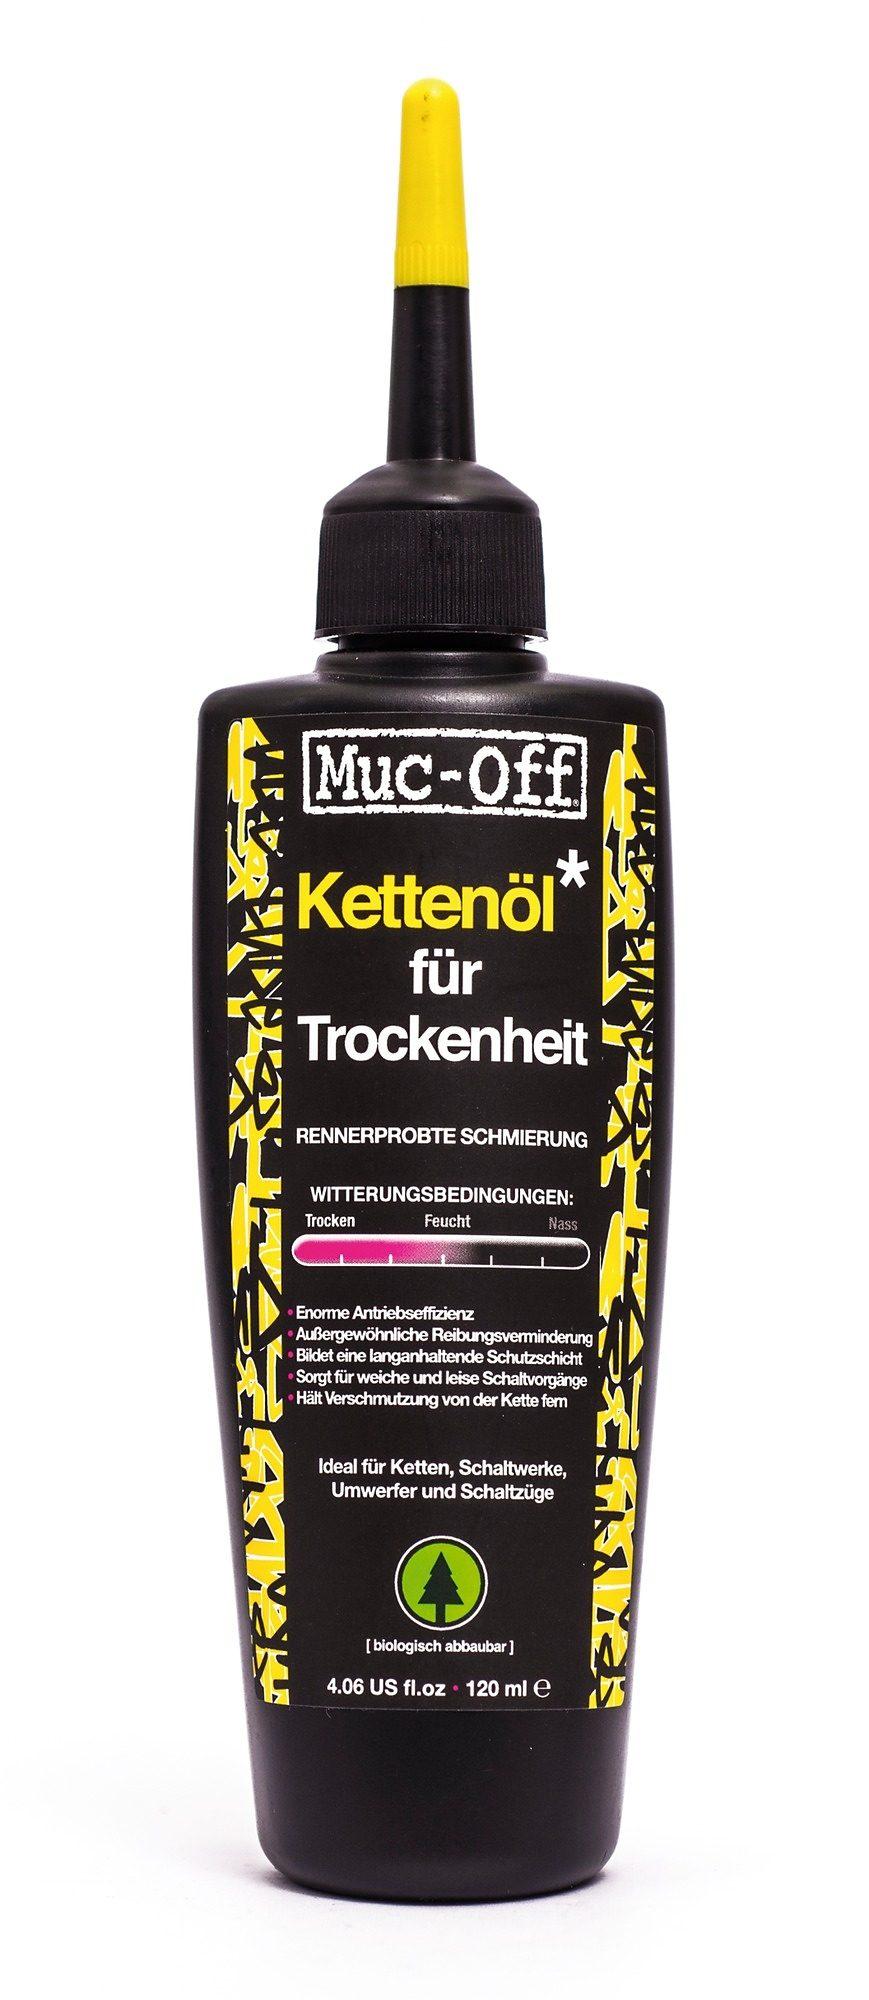 Muc-Off Fahrrad Reiniger »Dry Lube Kettenöl für Trockenheit 120 ml«